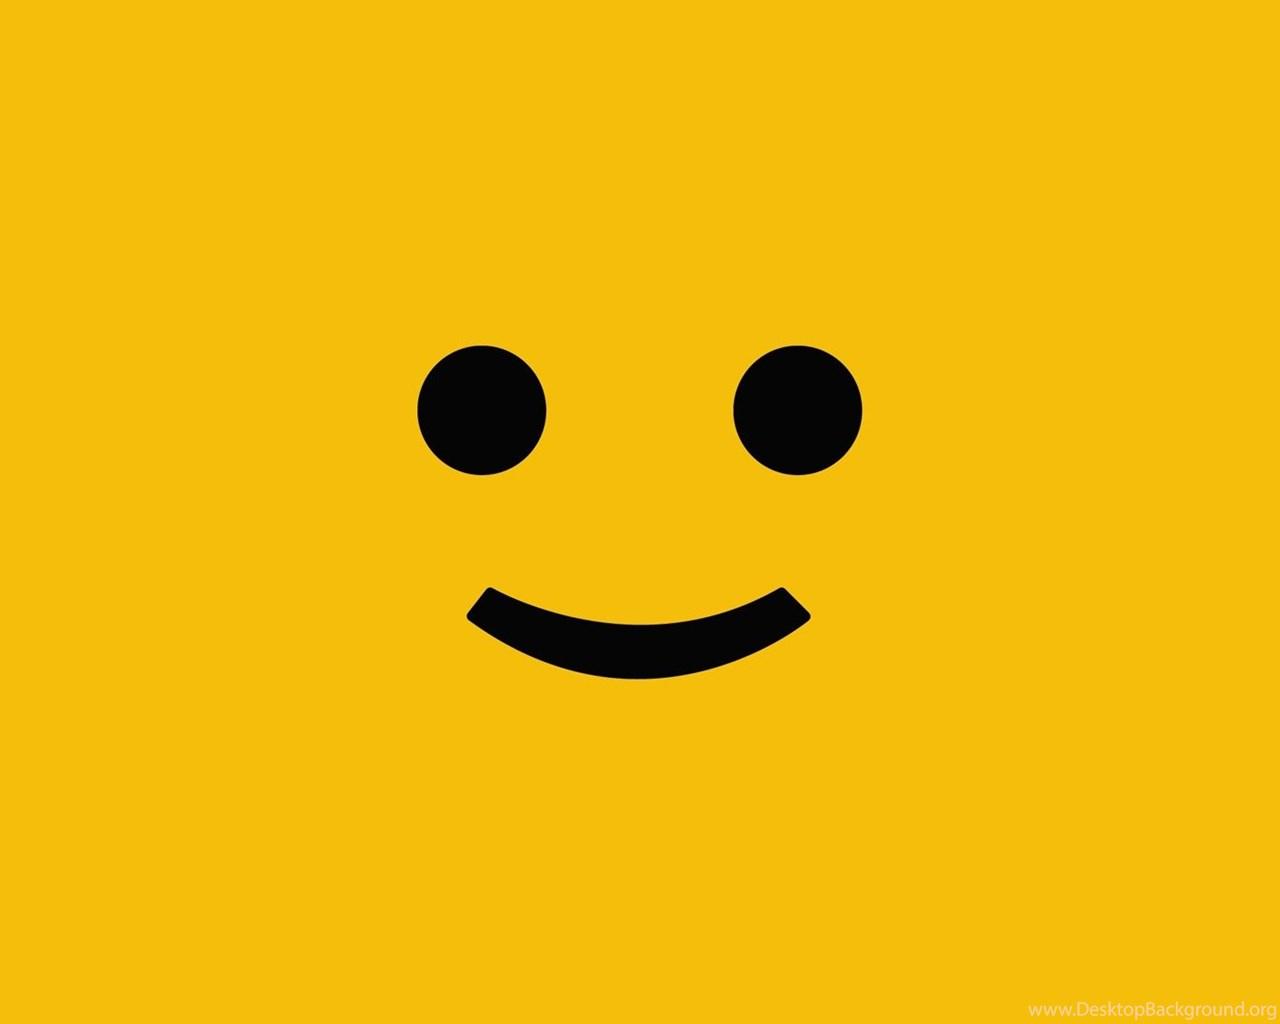 Cute desktop picture design funny smiley face wallpaper